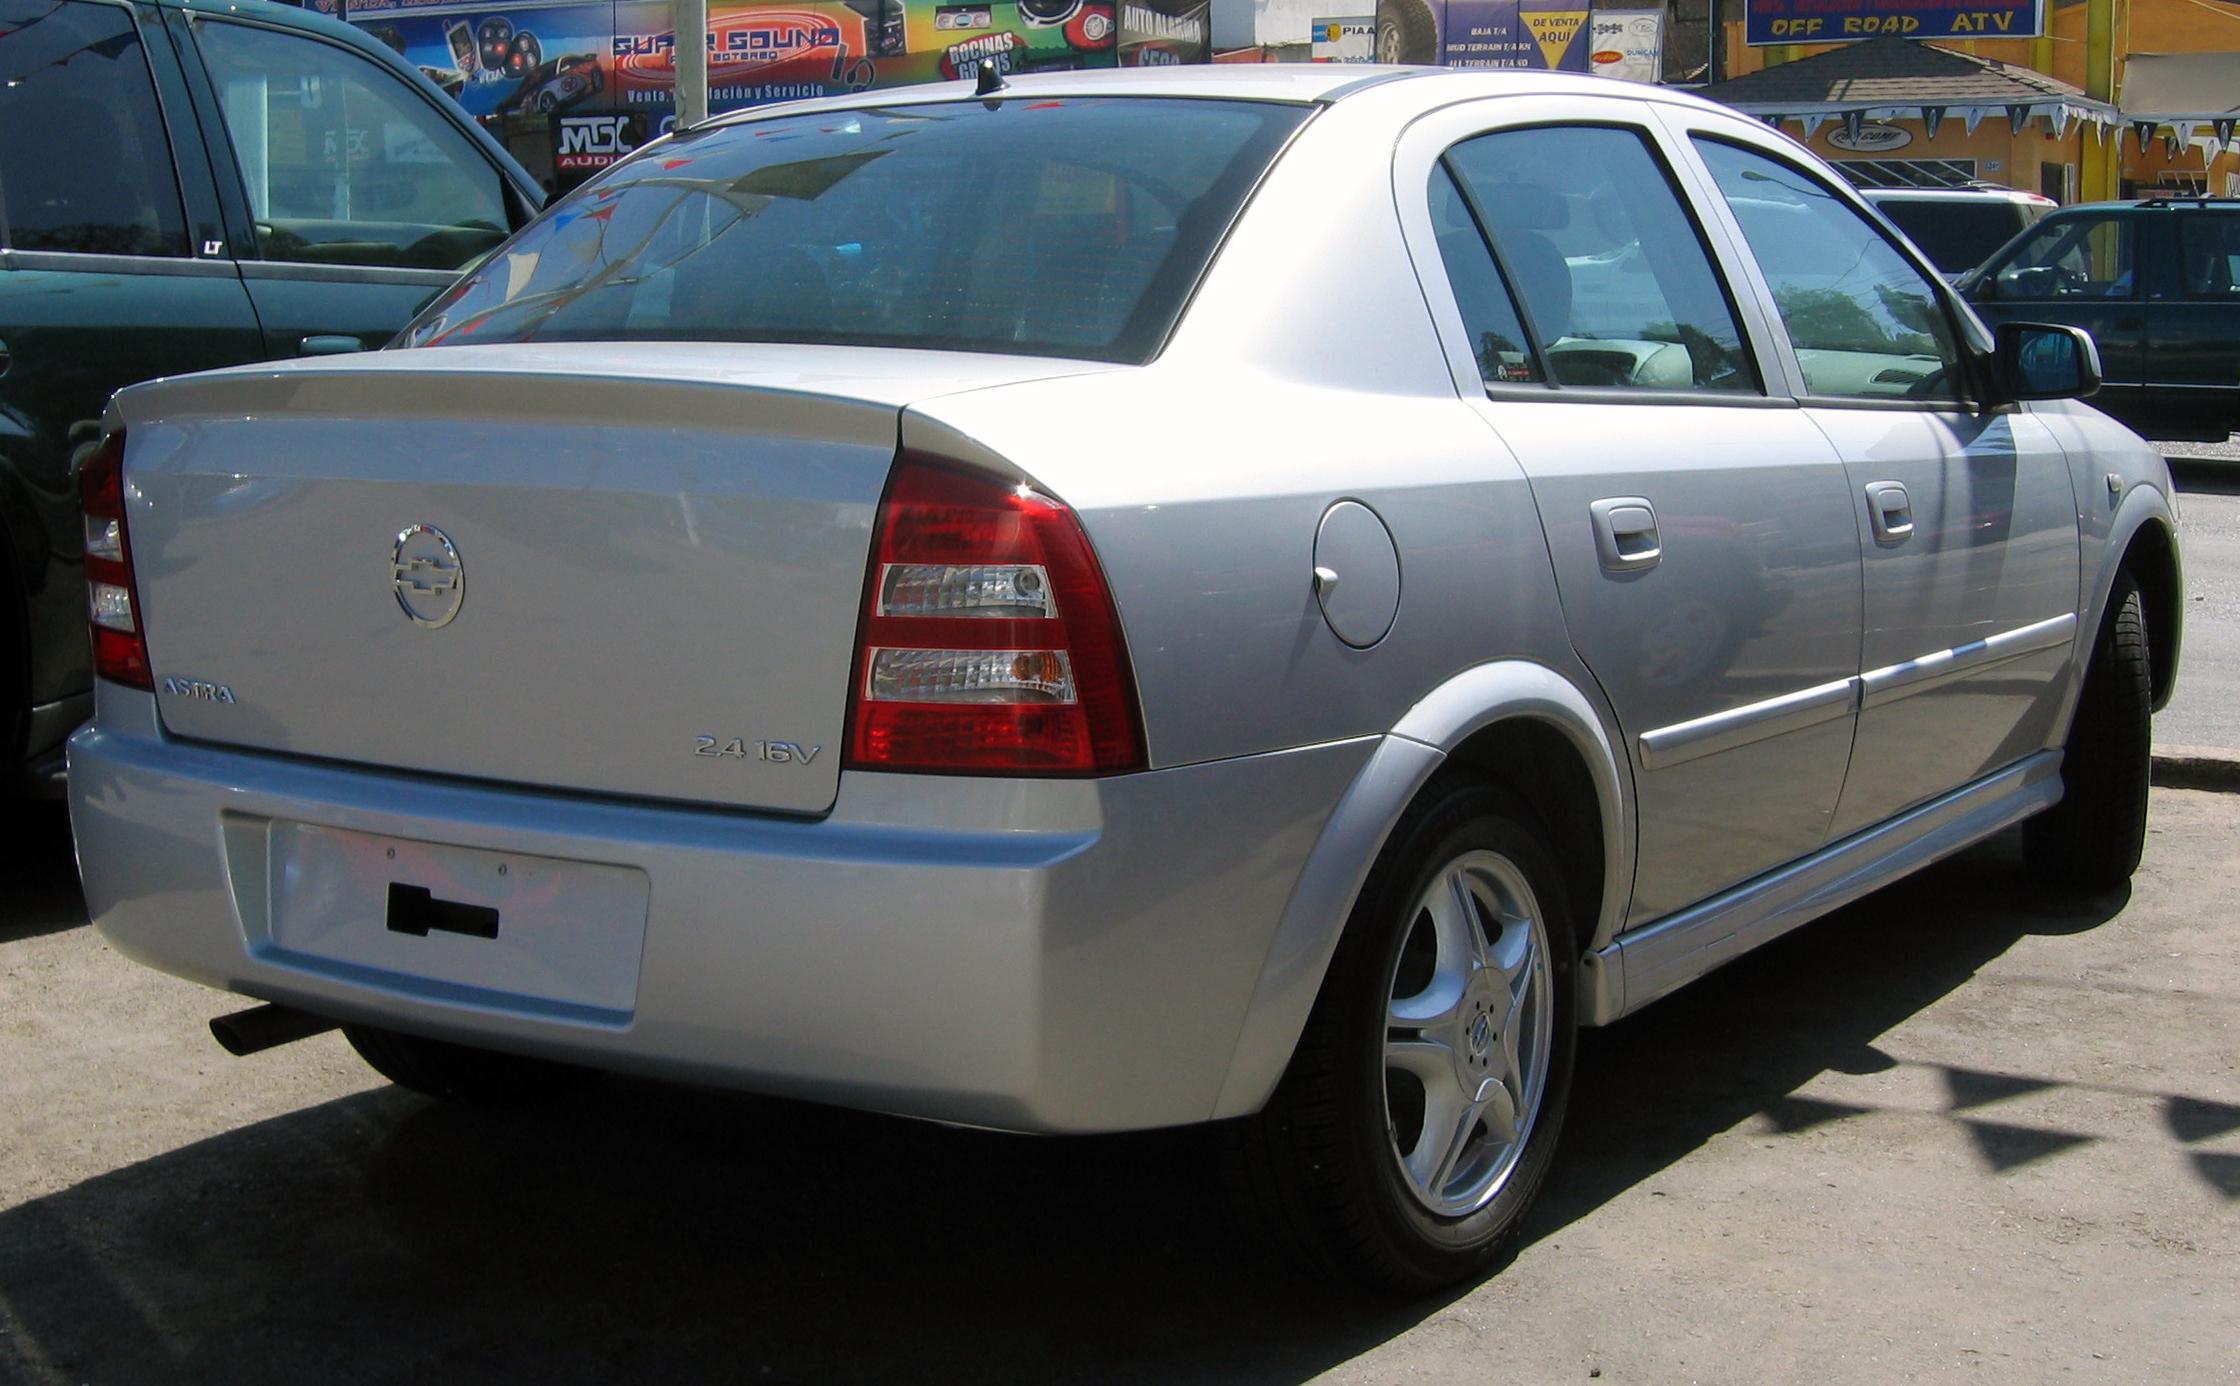 File:Chevrolet Astra 2.4.jpg - Wikimedia Commons